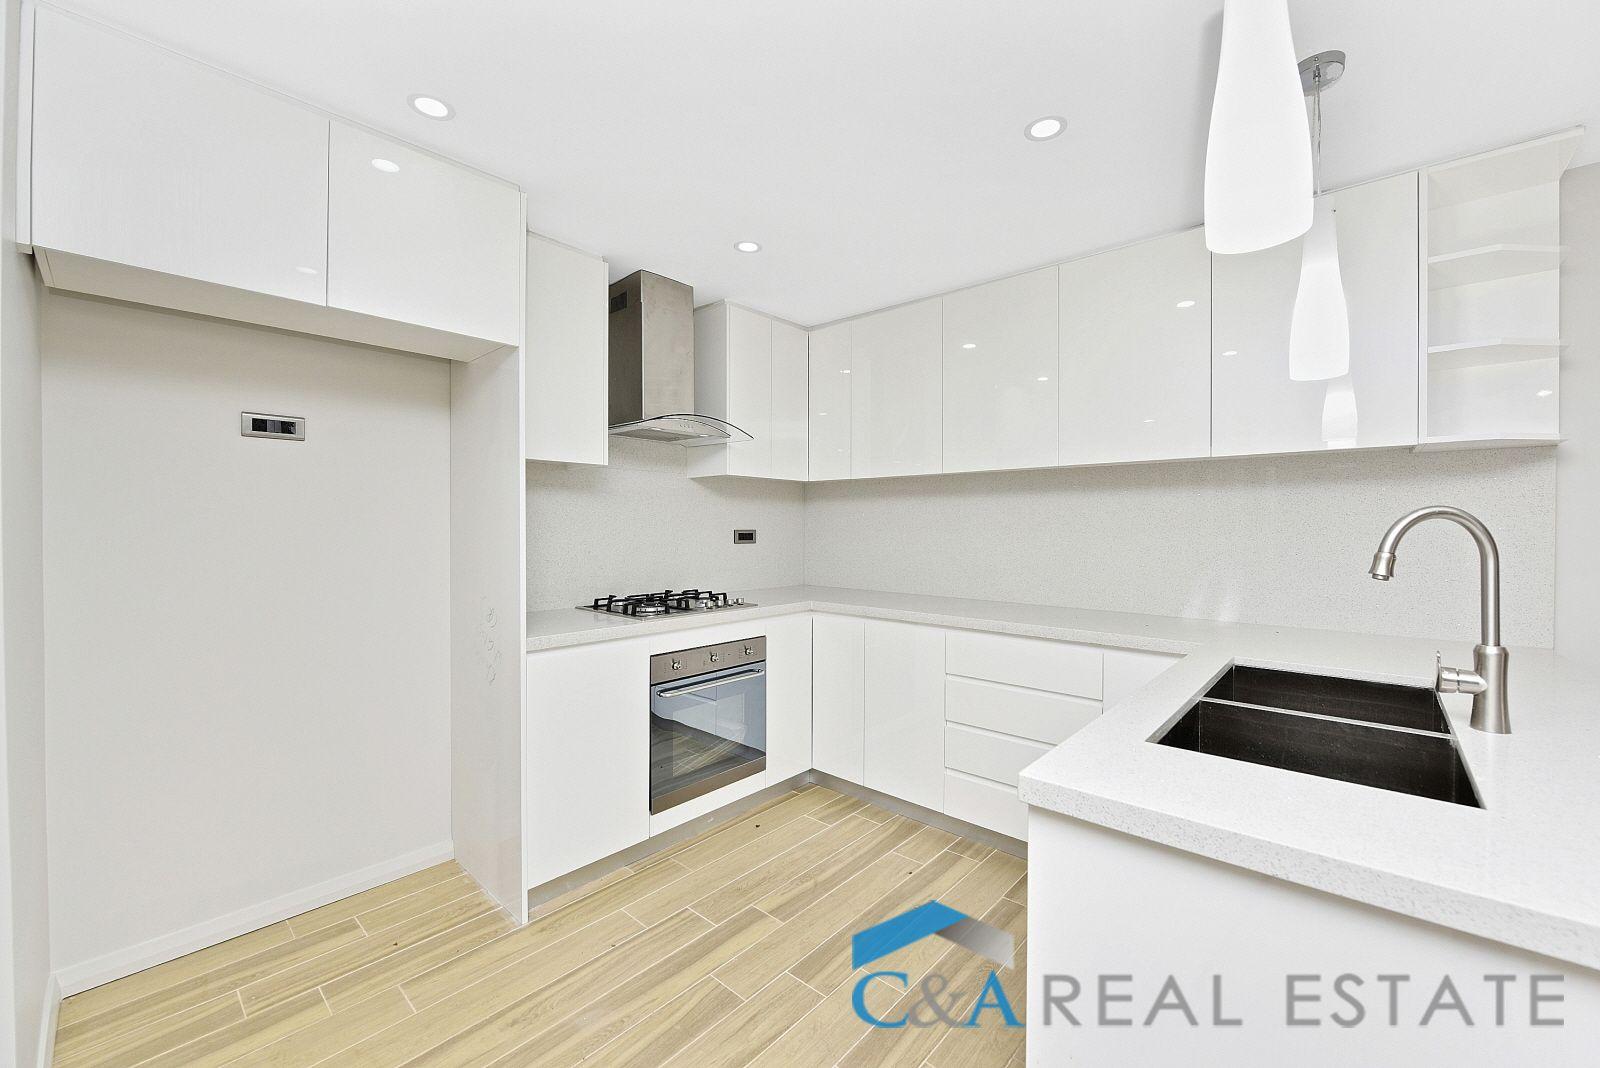 151 Dumaresq St, Campbelltown NSW 2560, Image 1